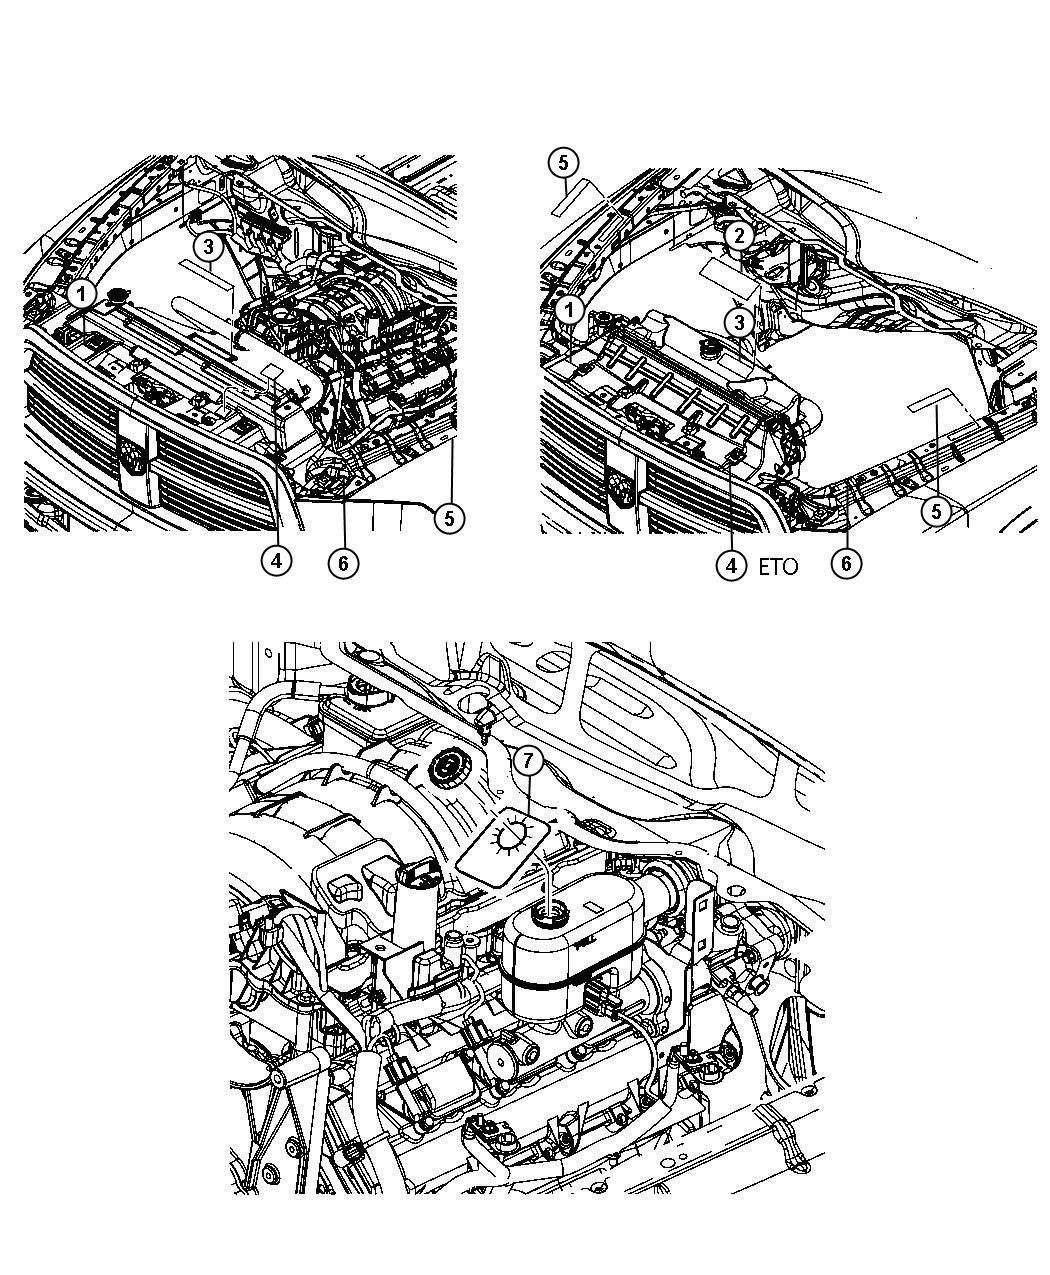 Ram 3500 Label. Battery jump start. Engine, drive, diesel